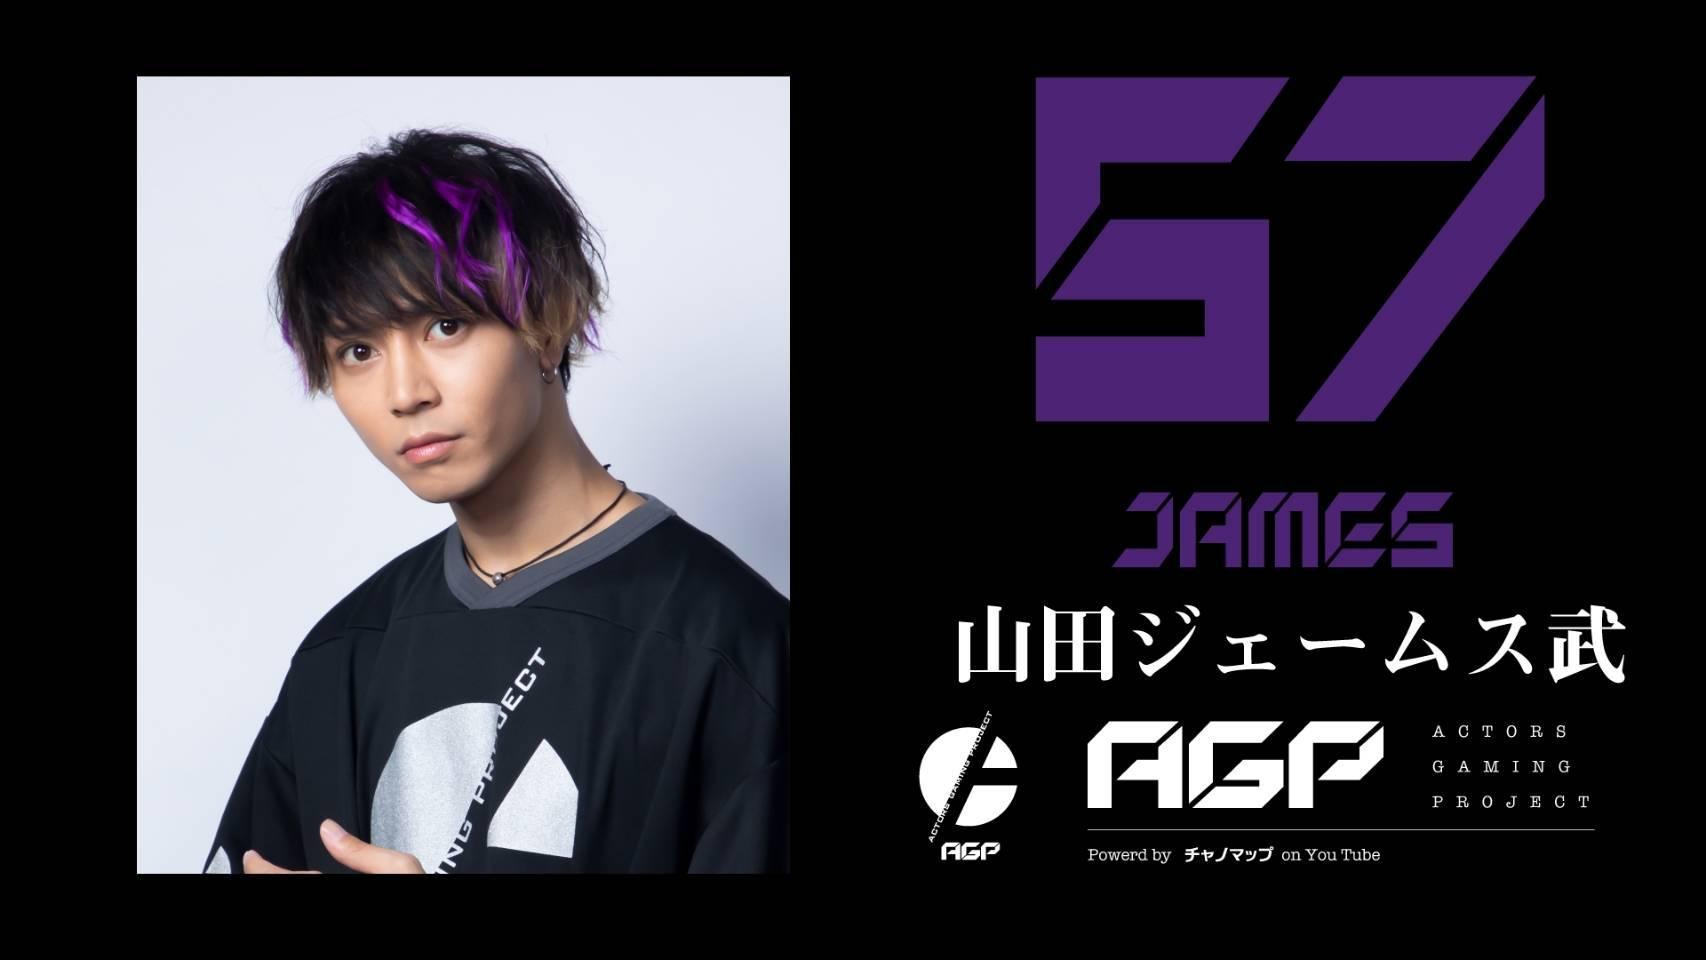 「ACTORS GAMING PROJECT」 57 山田ジェームス武